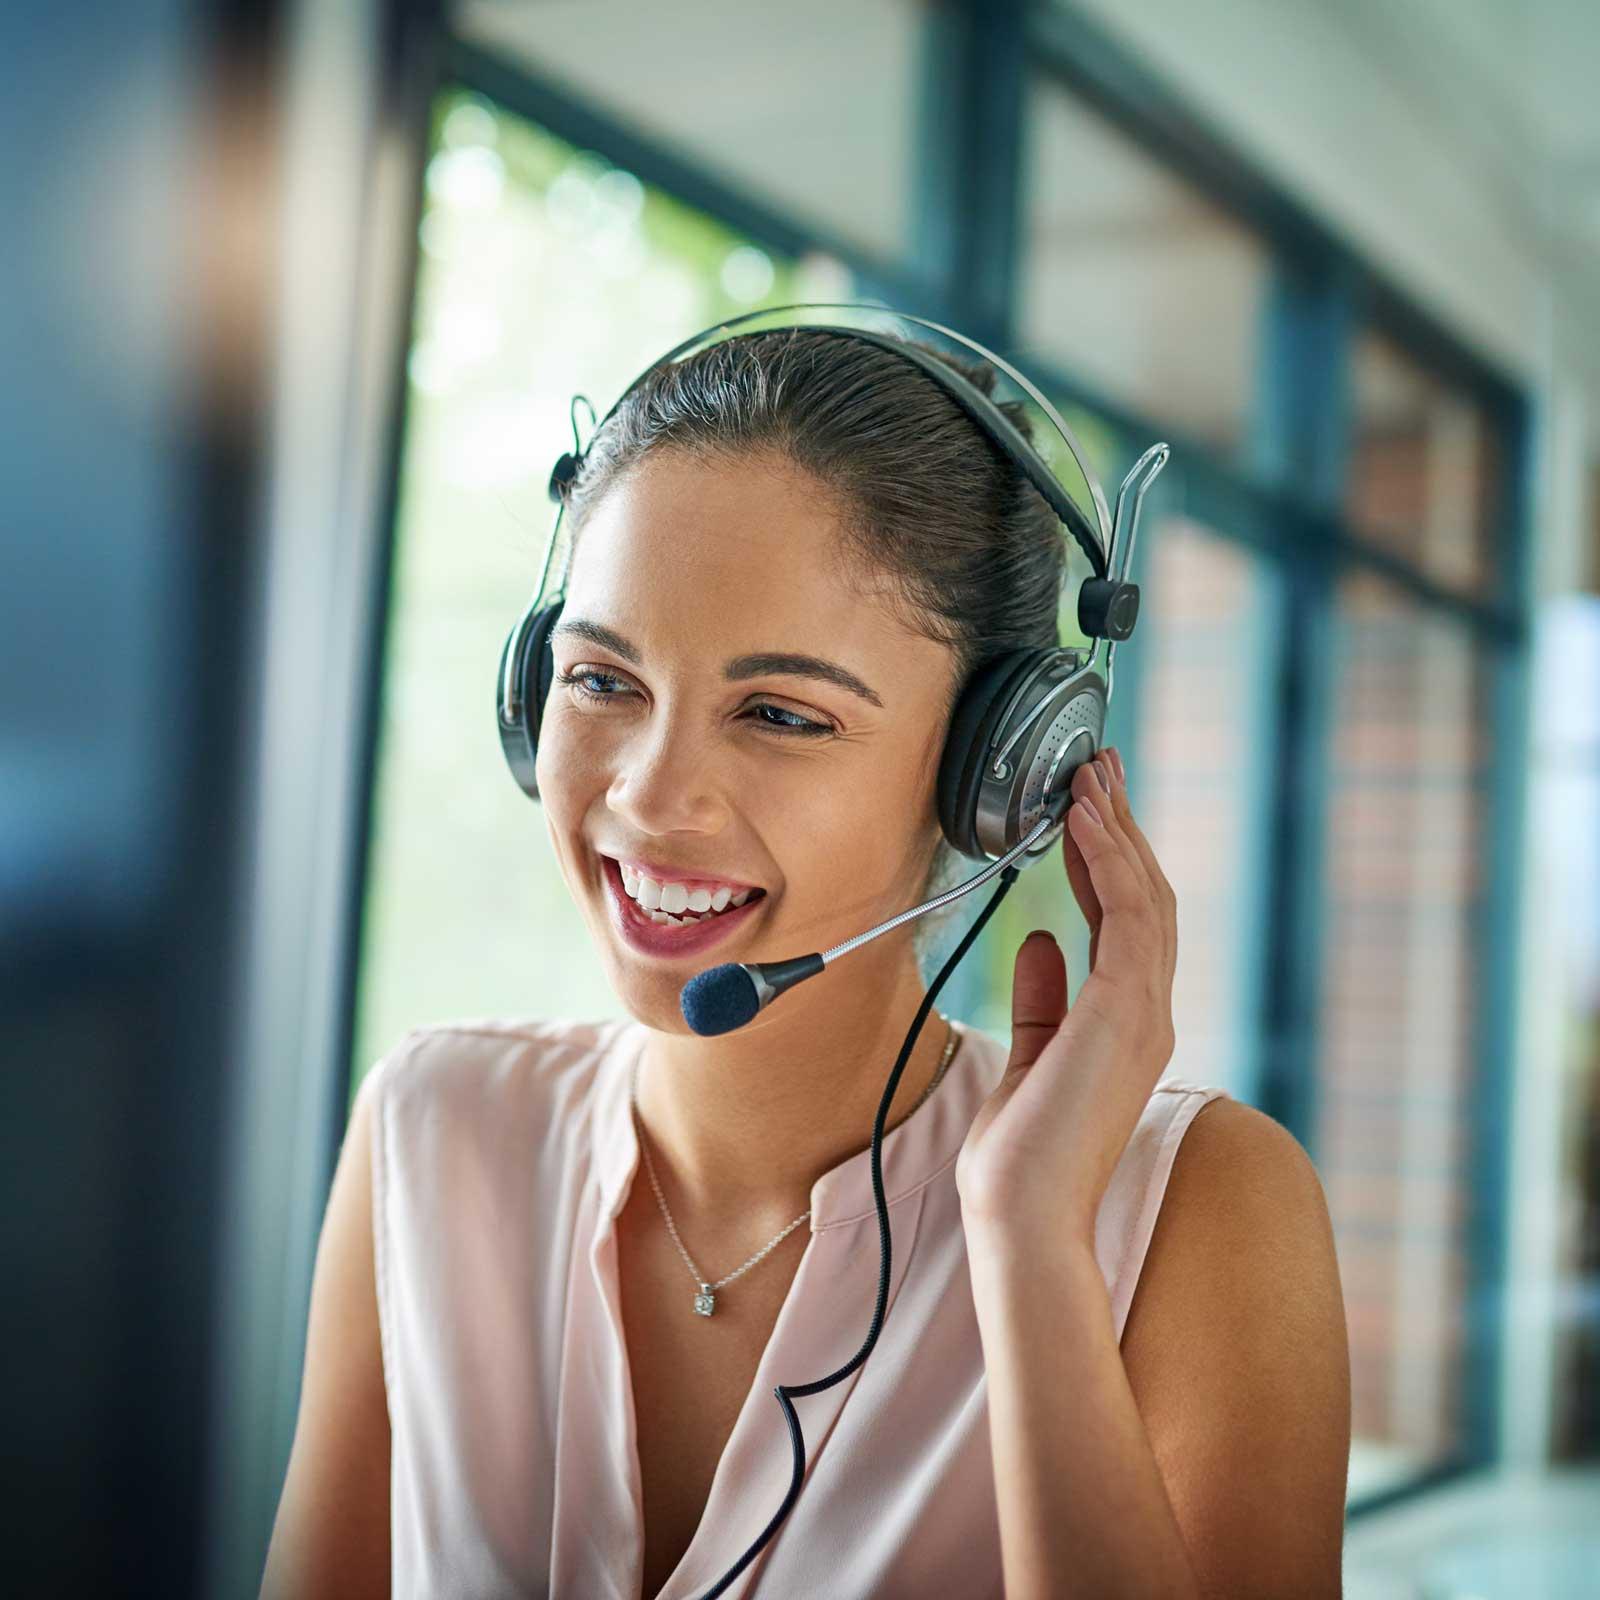 productive customer support representative